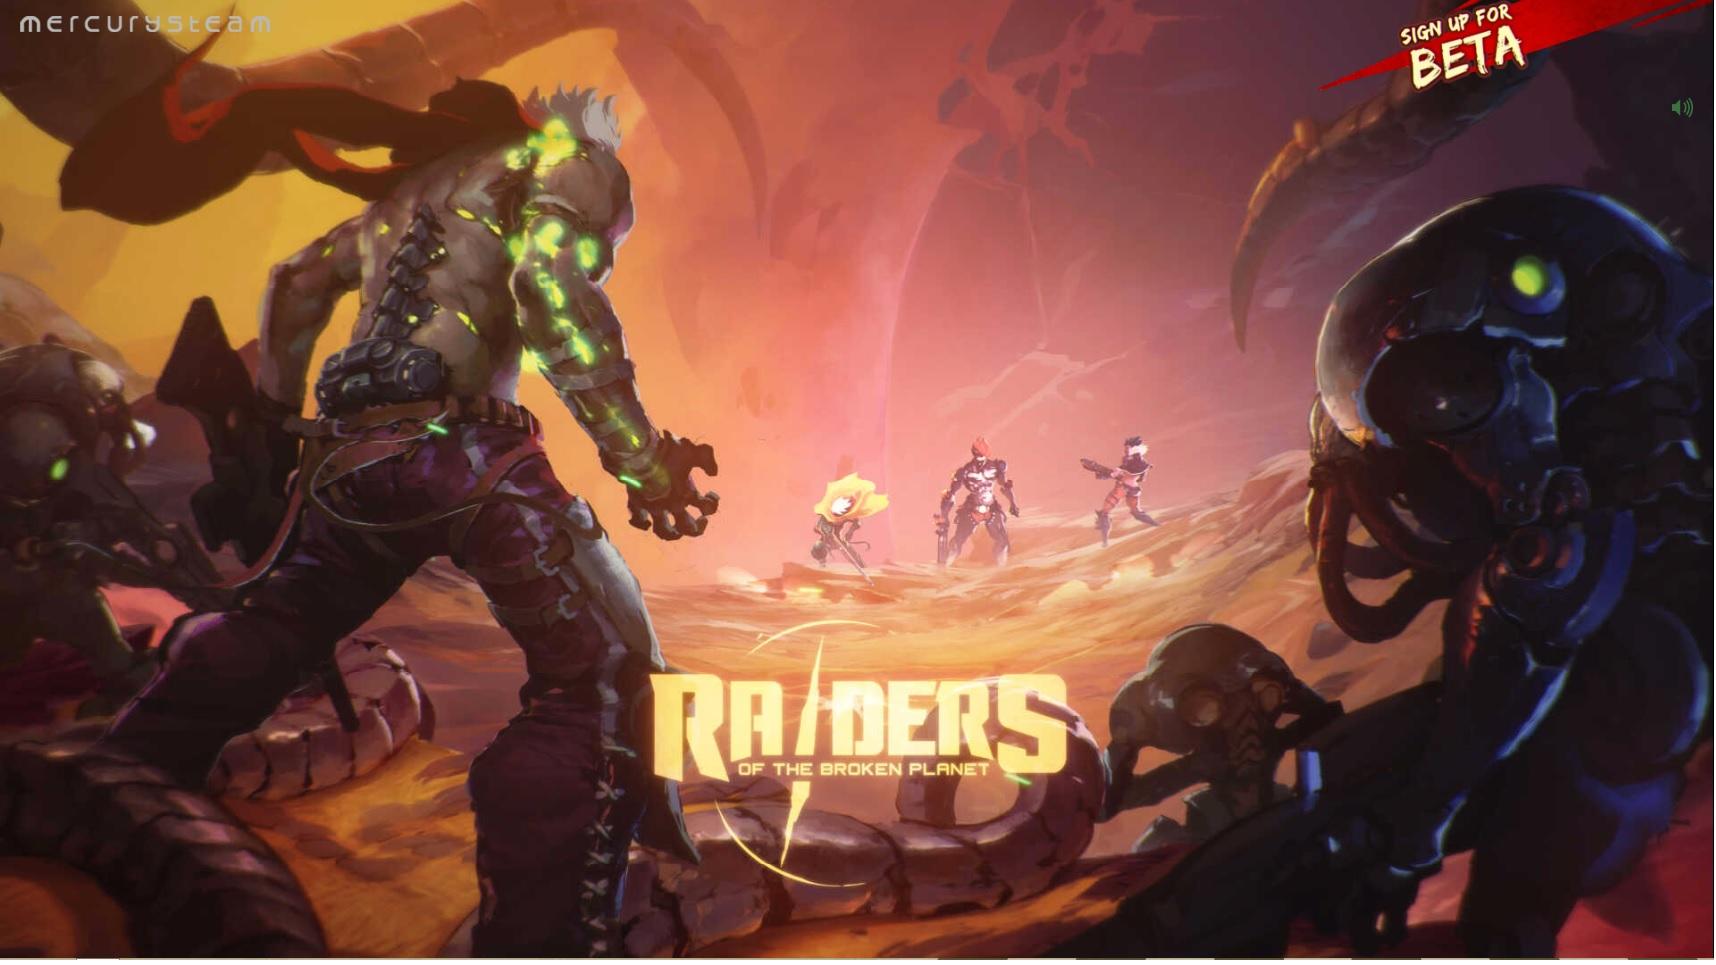 Raiders of Broken Planet